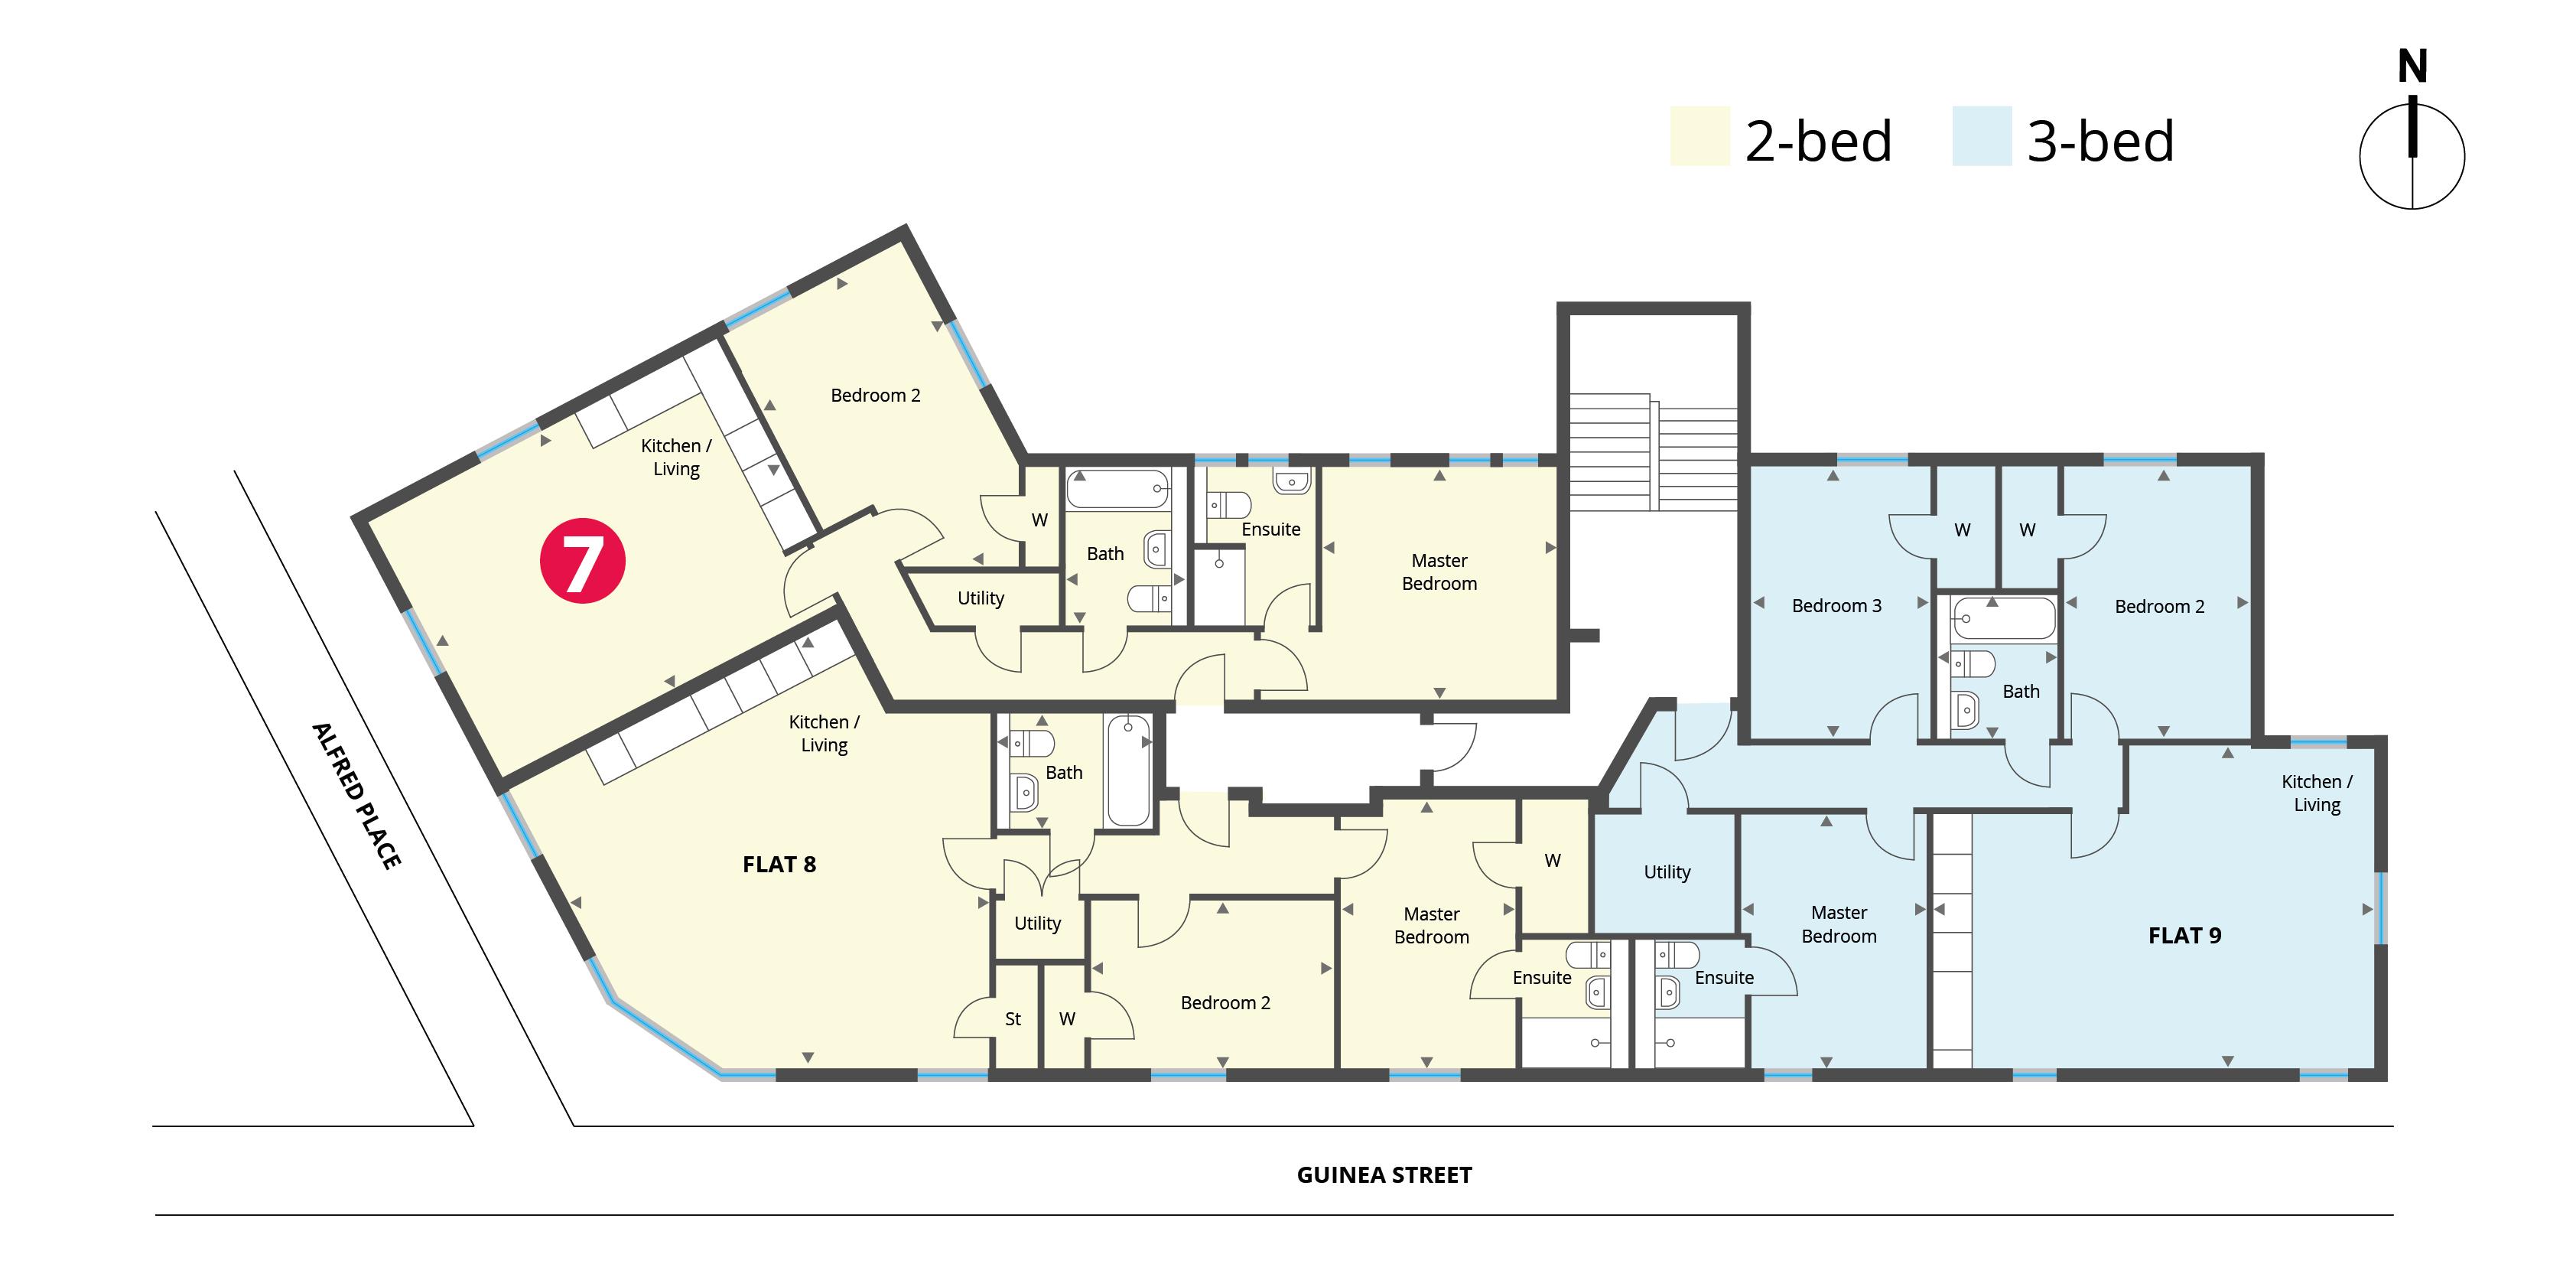 Floorplan for Flat 7